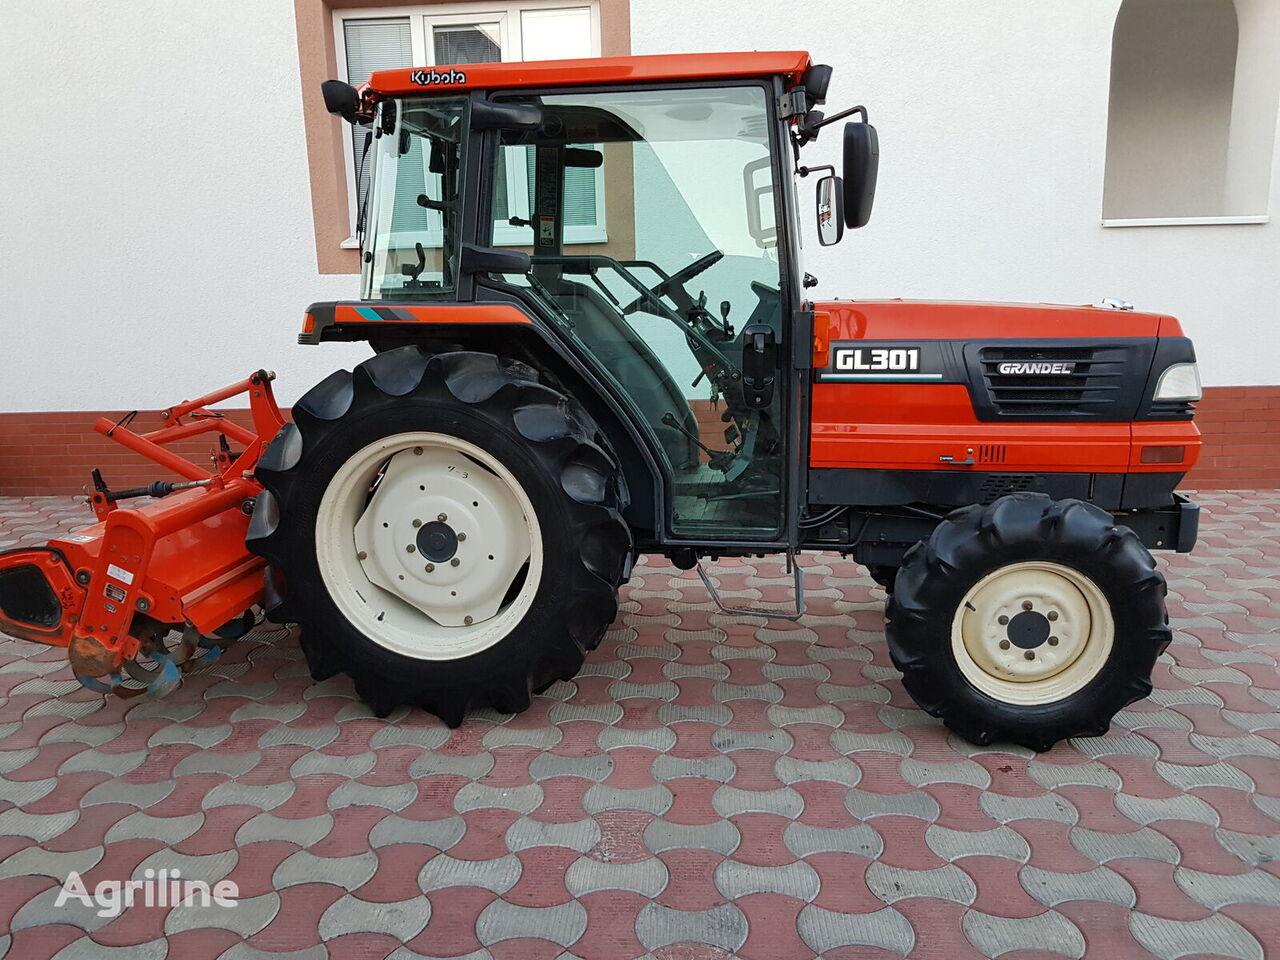 malotraktor KUBOTA GL 301